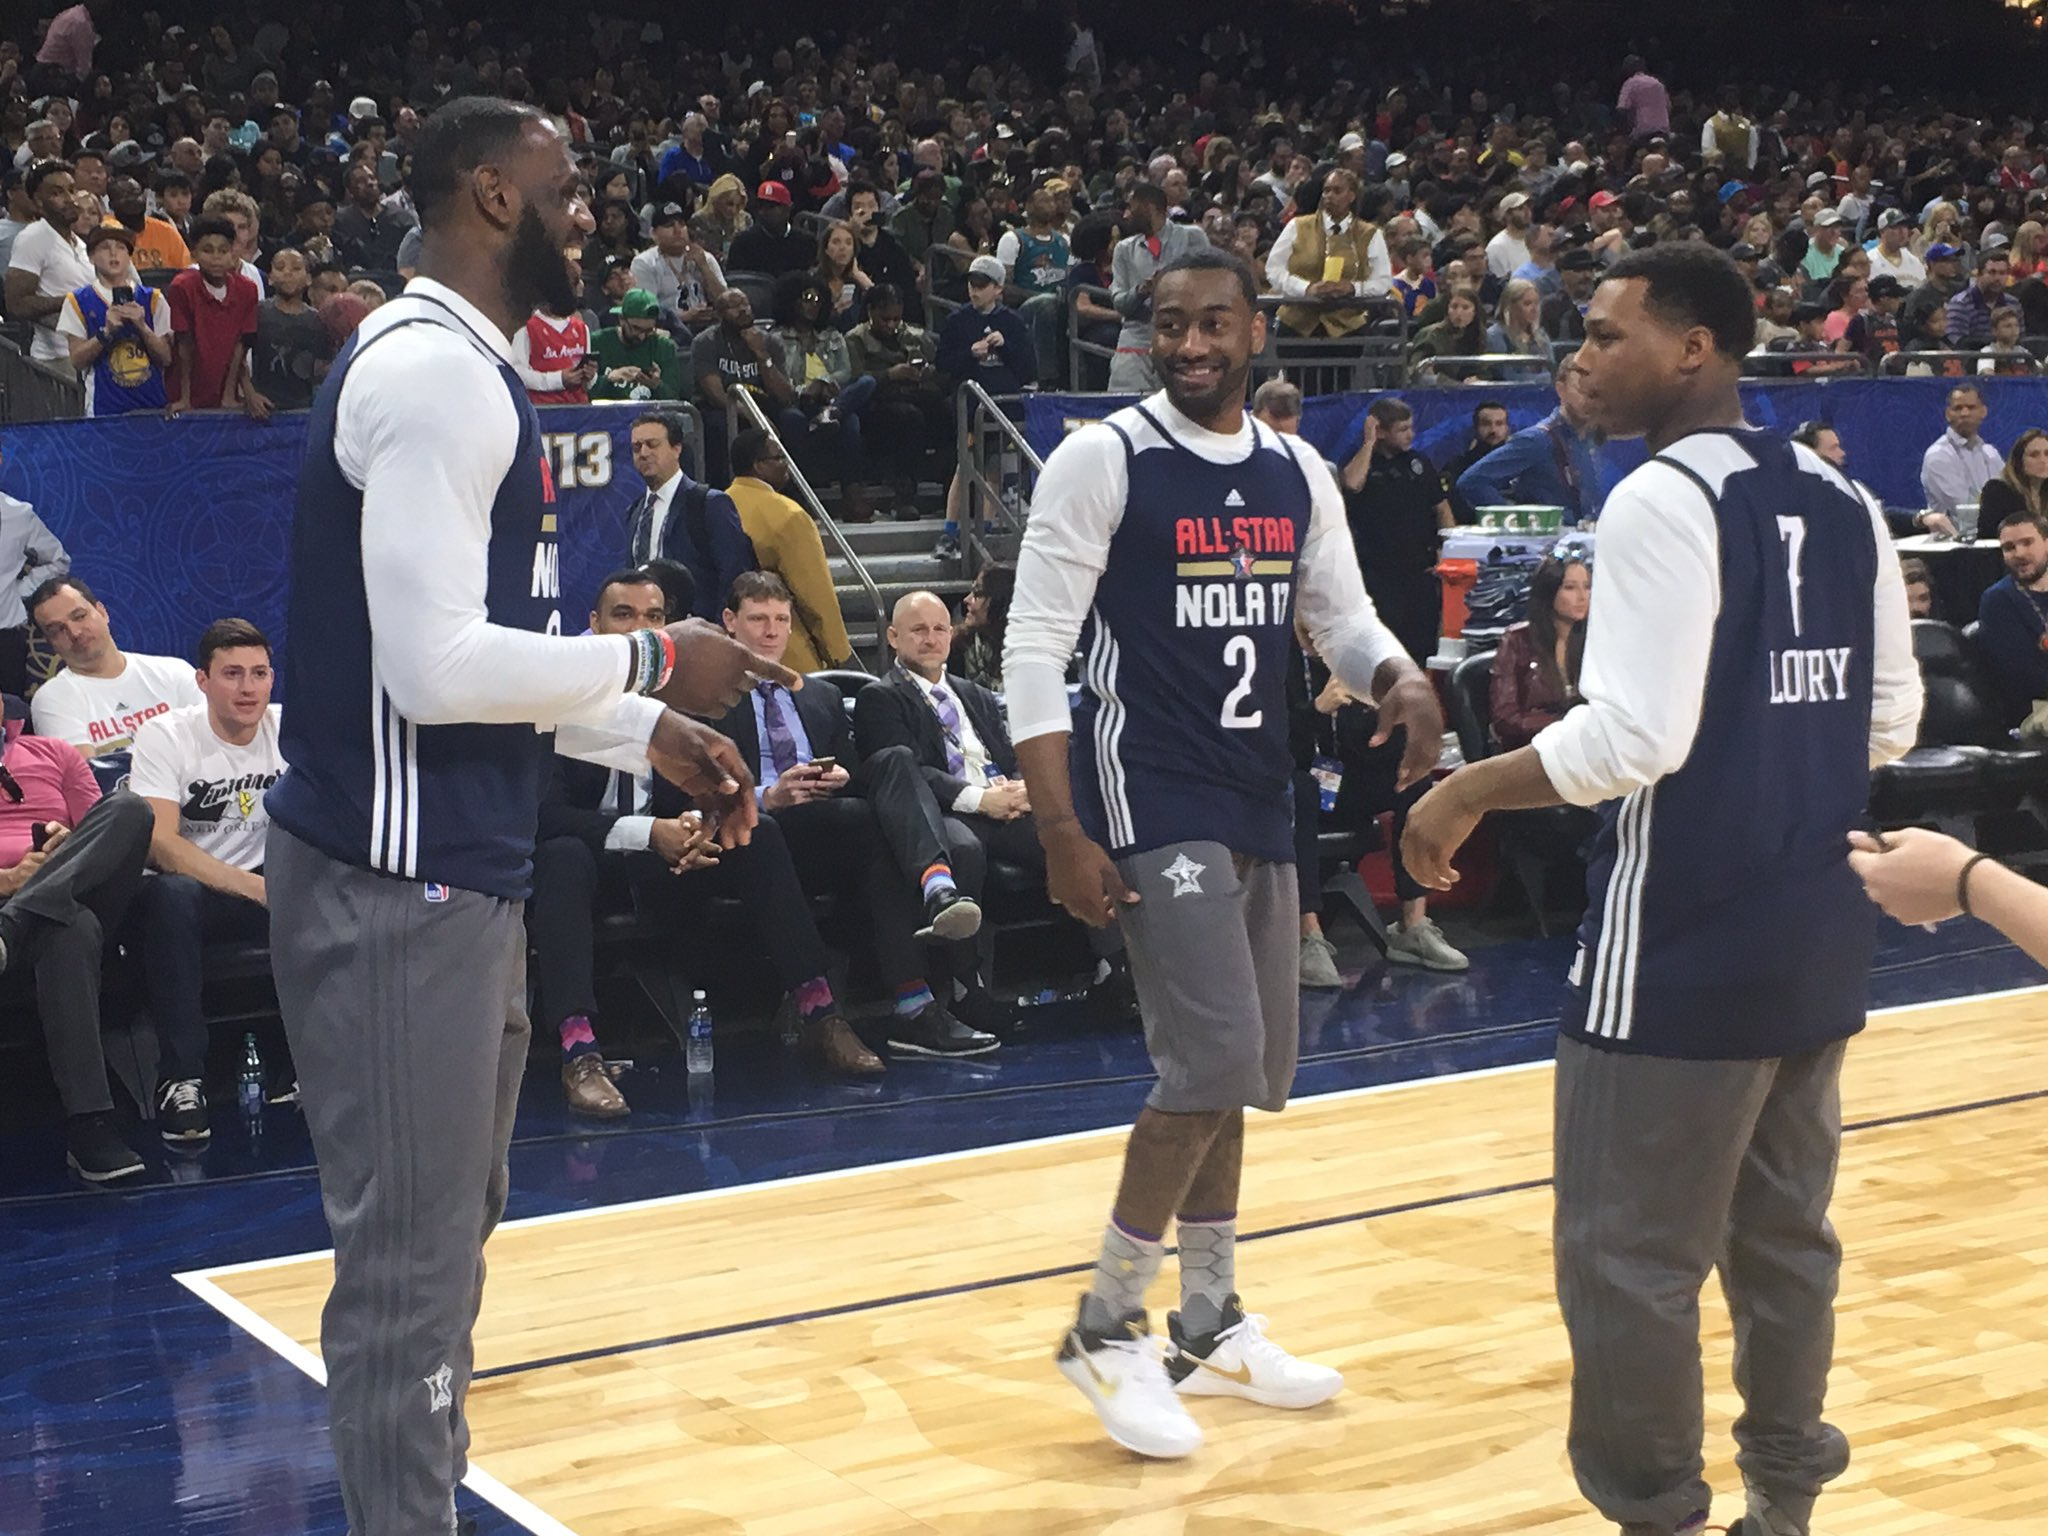 LeBron, John Wall & Kyle Lowry having some fun at #NBAAllStar #TeamEAST Practice! https://t.co/0s2pQ1HPpc